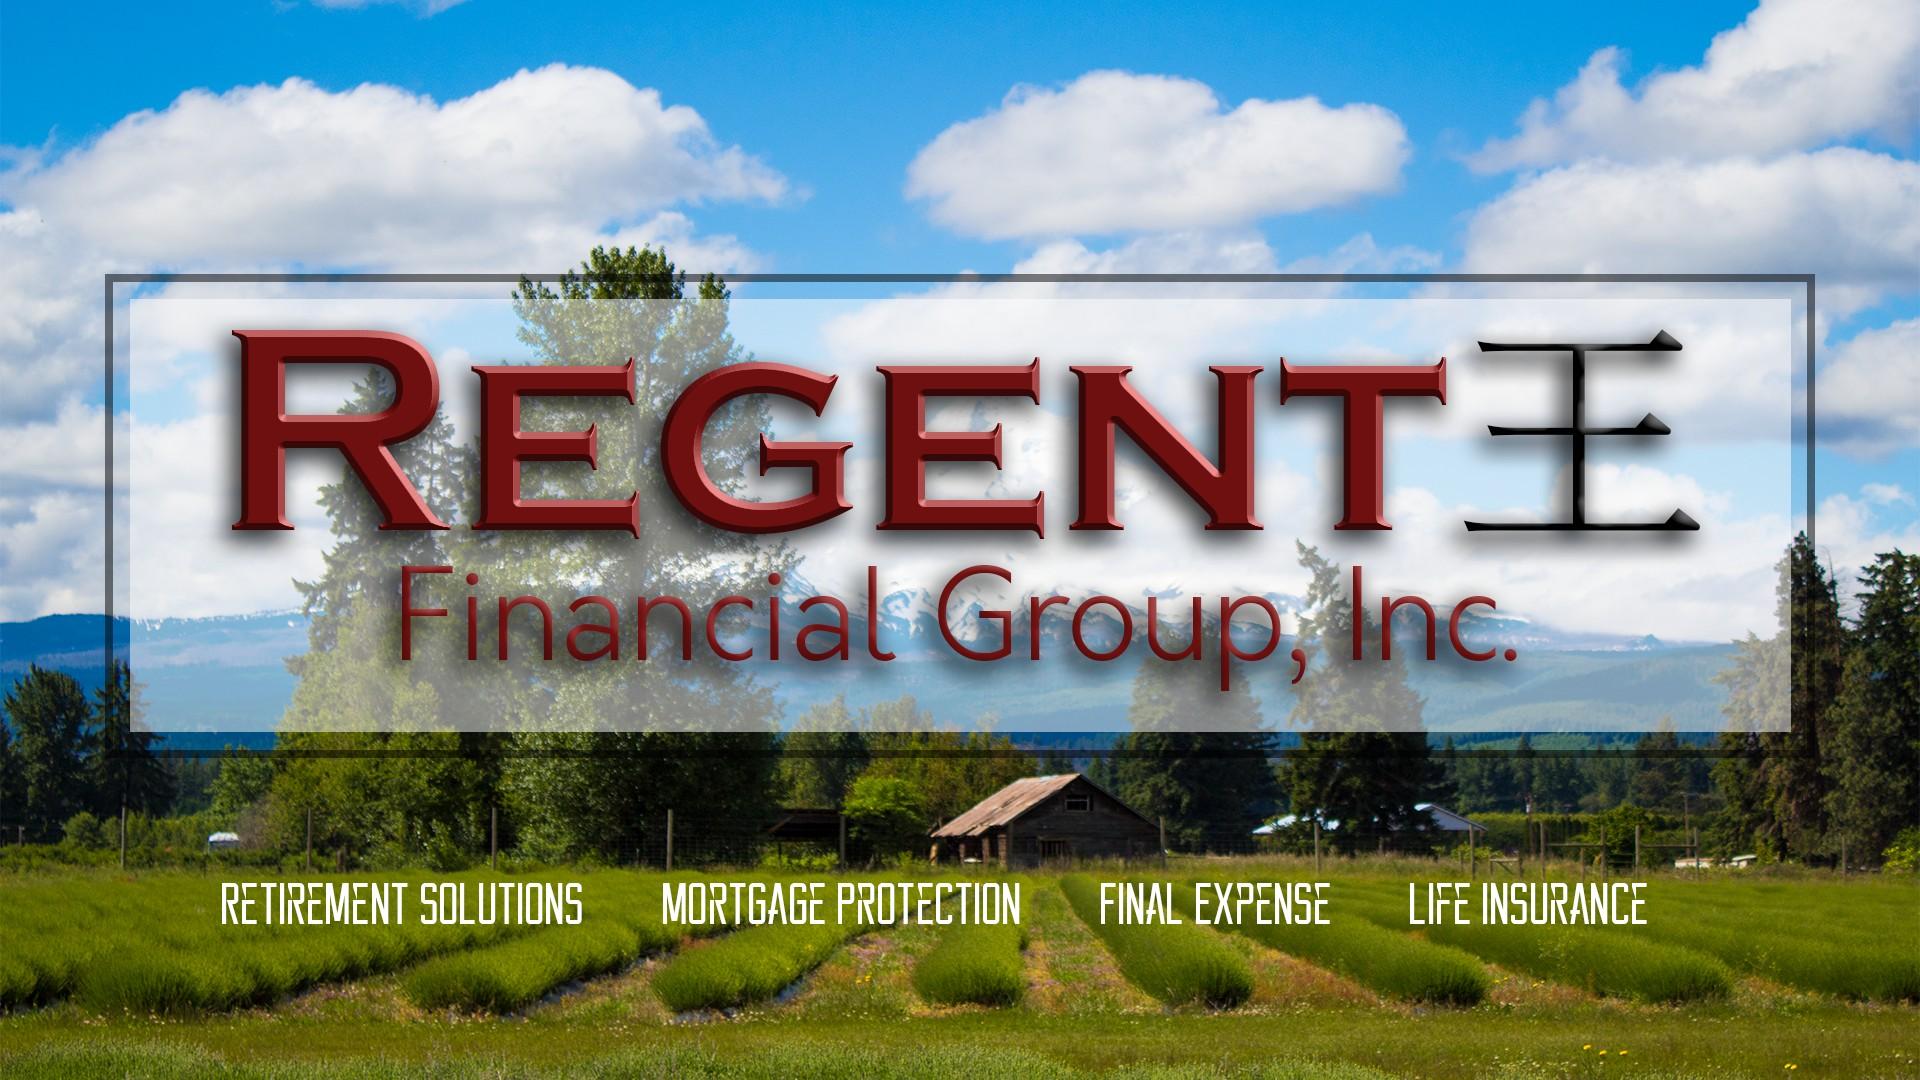 Regent Financial Group, Inc  | LinkedIn